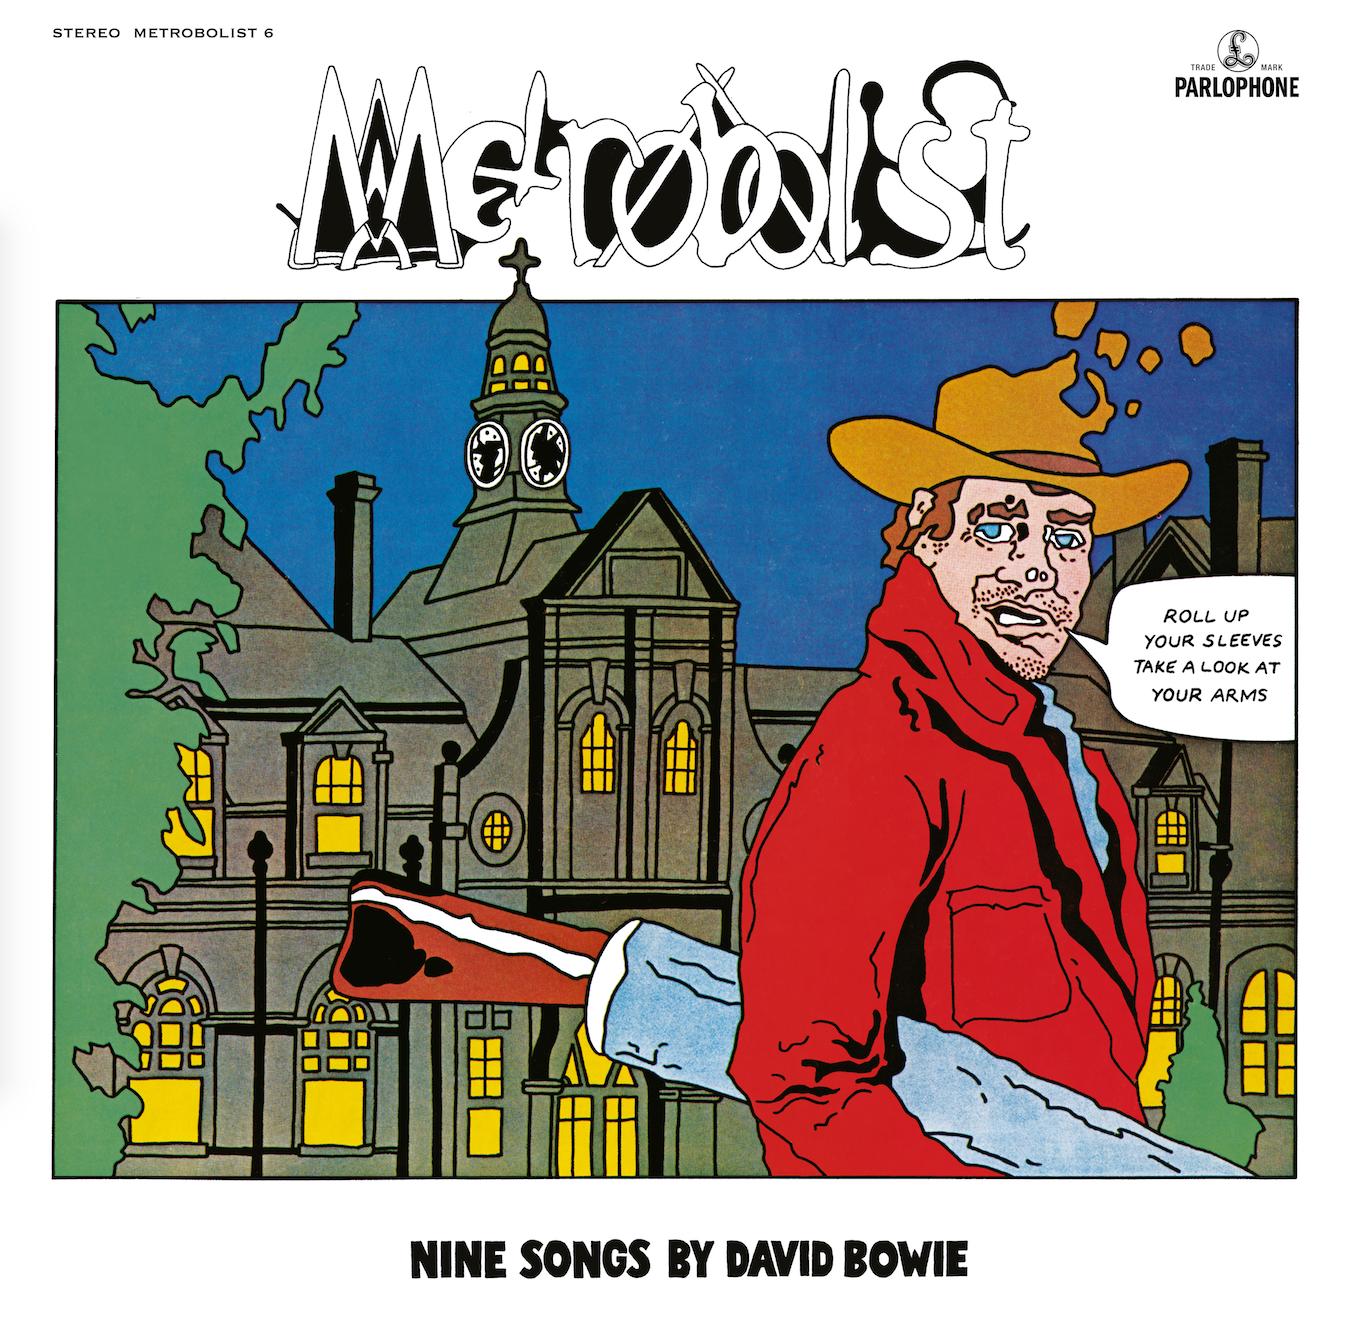 David Bowie - Metrobolist (aka The Man Who Sold The World) [LTD LP]